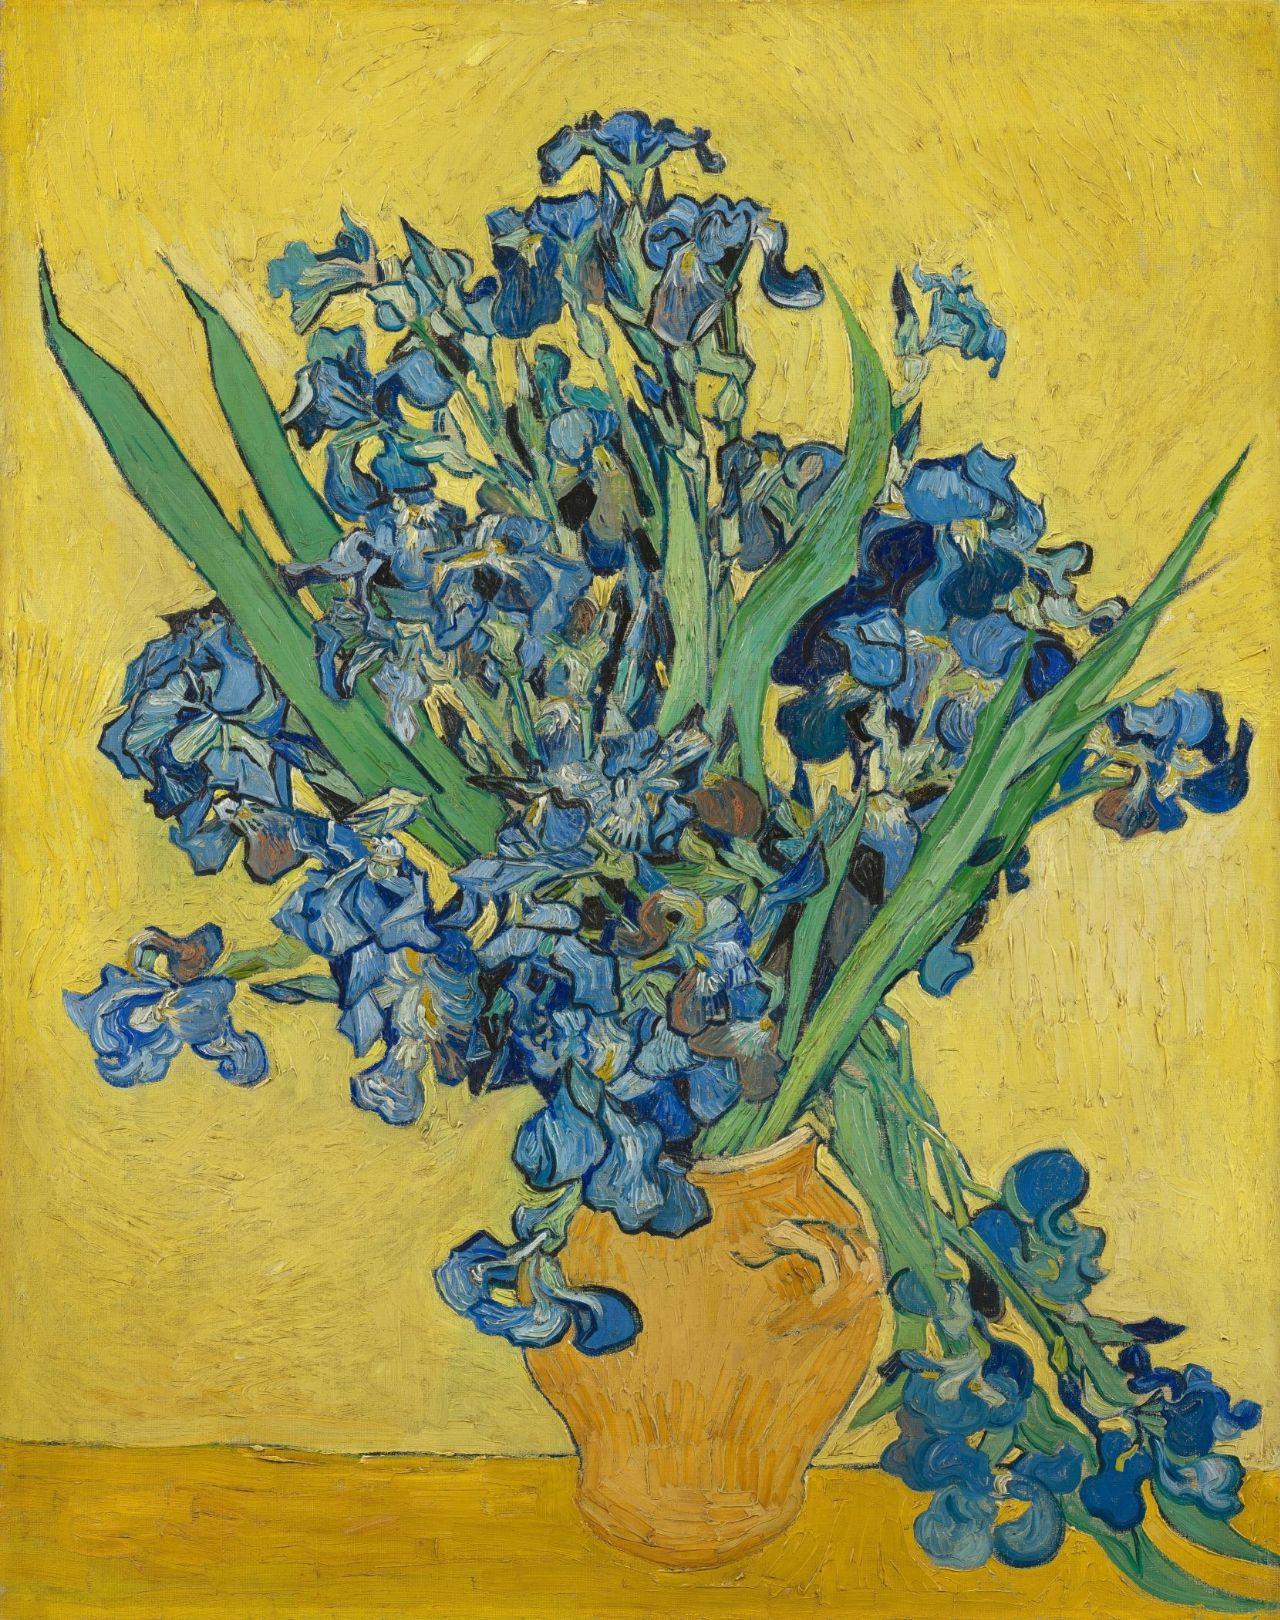 Irises - Vincent van Gogh - Van Gogh Museum